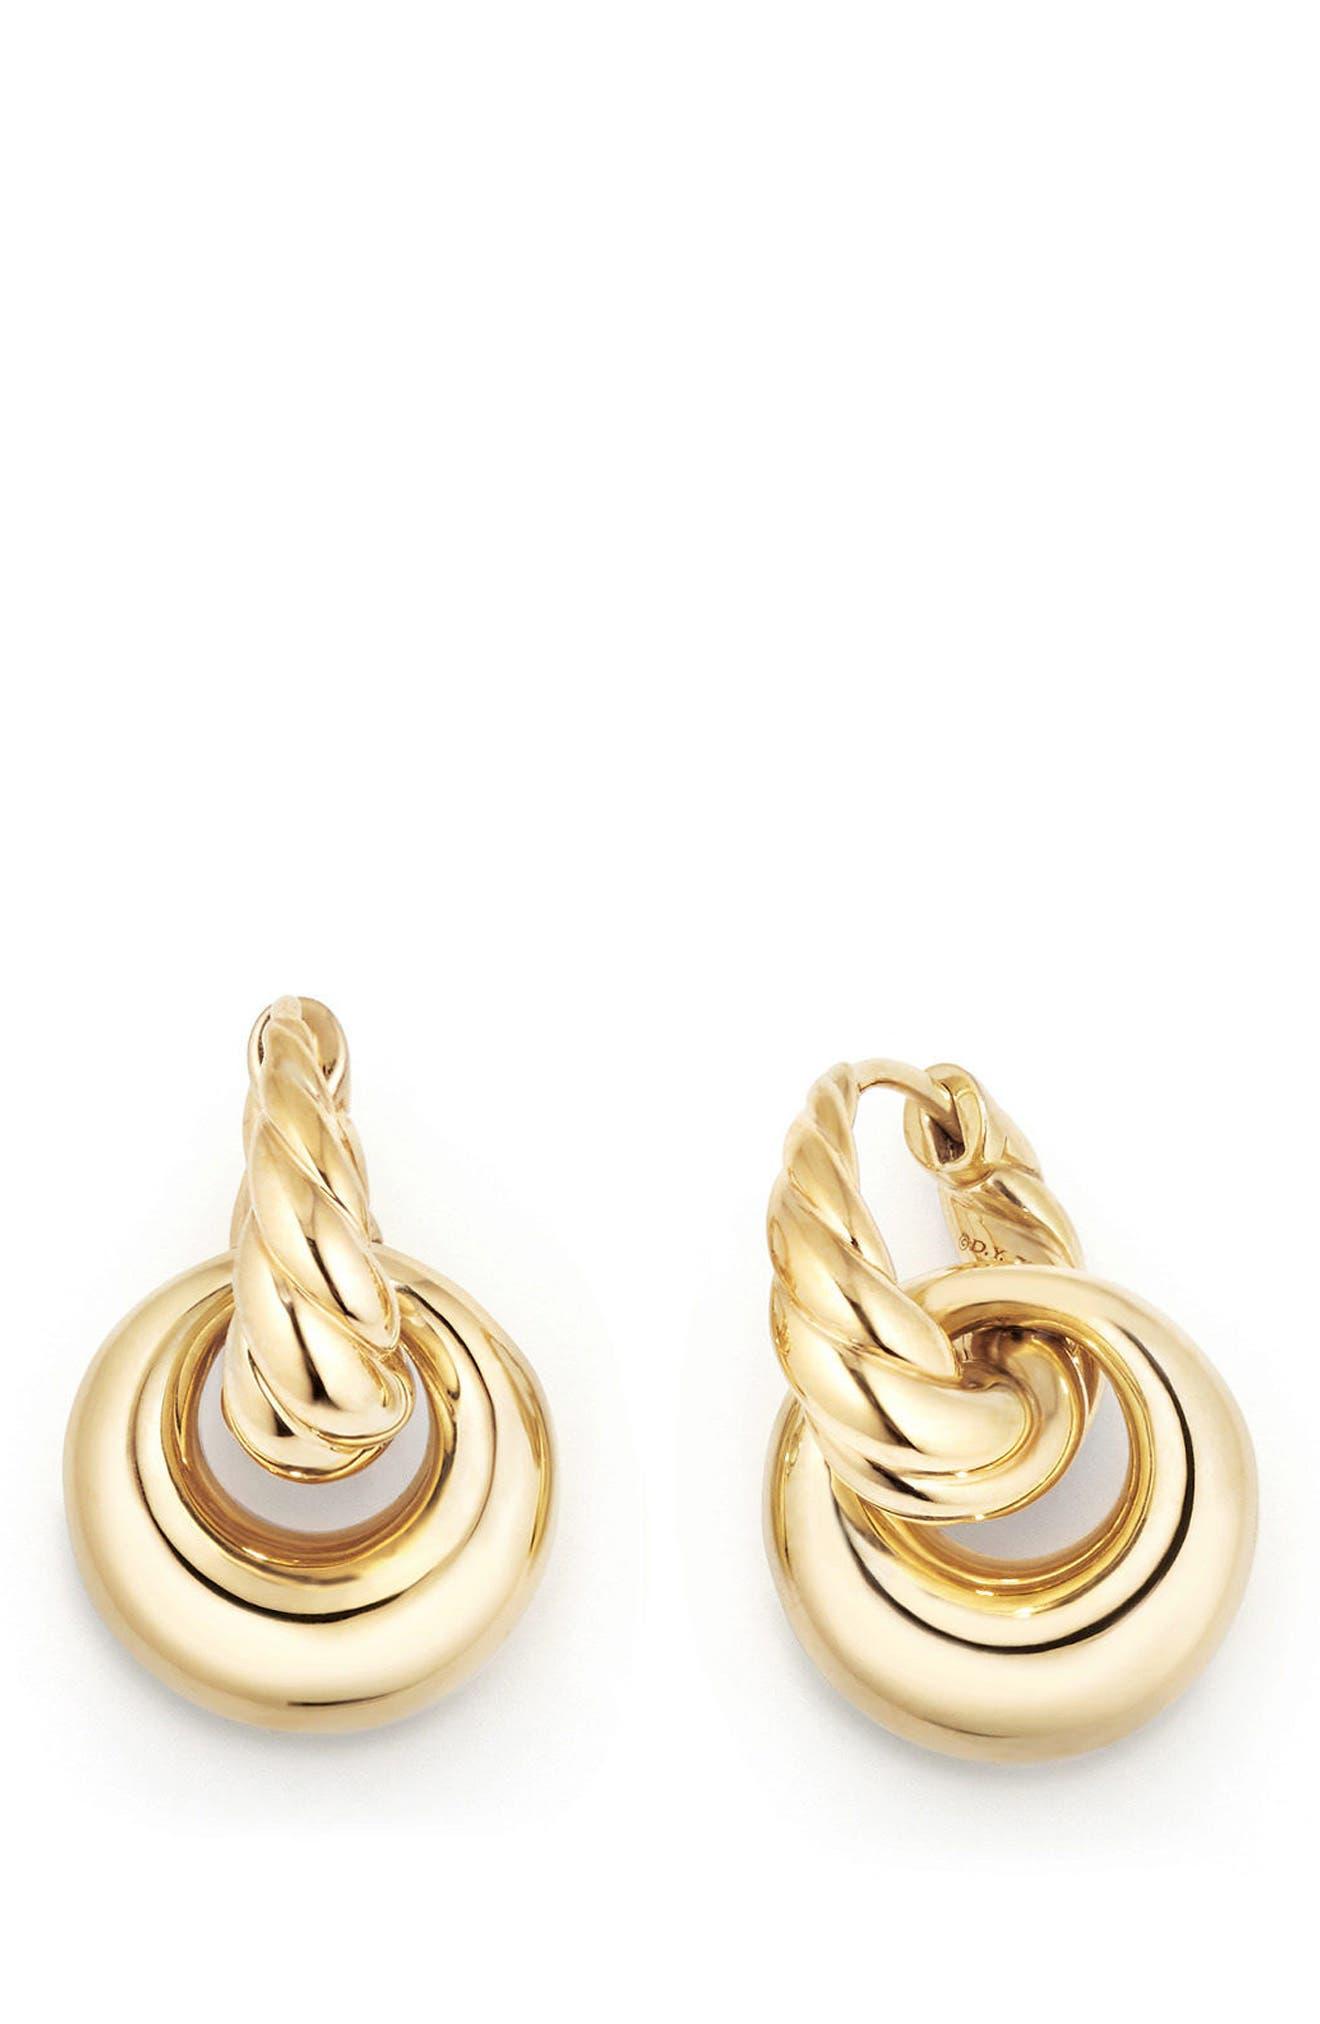 DAVID YURMAN, Pure Form<sup>®</sup> Drop Earrings in 18K Yellow Gold, Alternate thumbnail 2, color, YELLOW GOLD